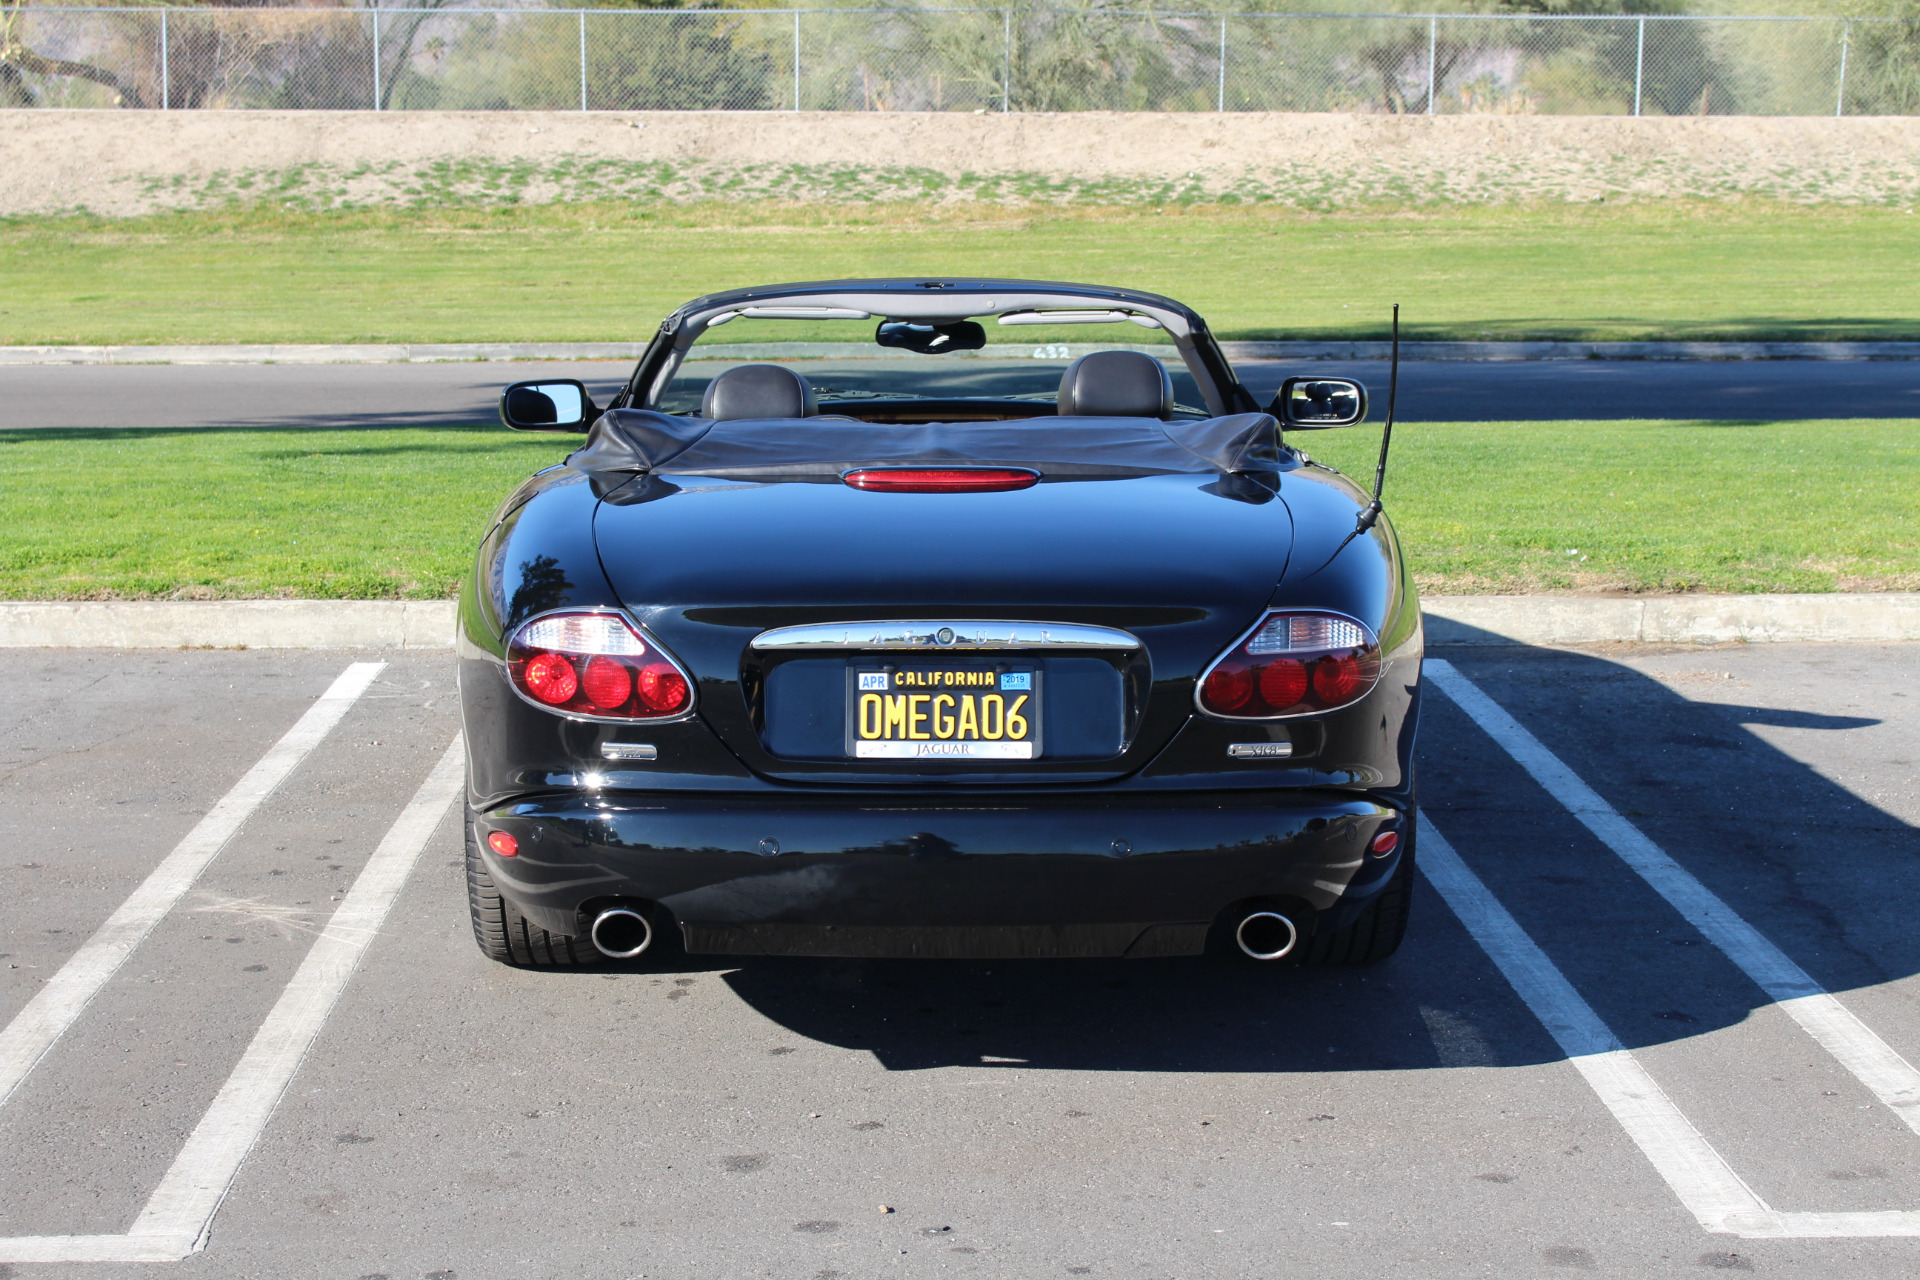 2006 Jaguar XK-Series Victory Edition XK8 Stock # JO261 ...